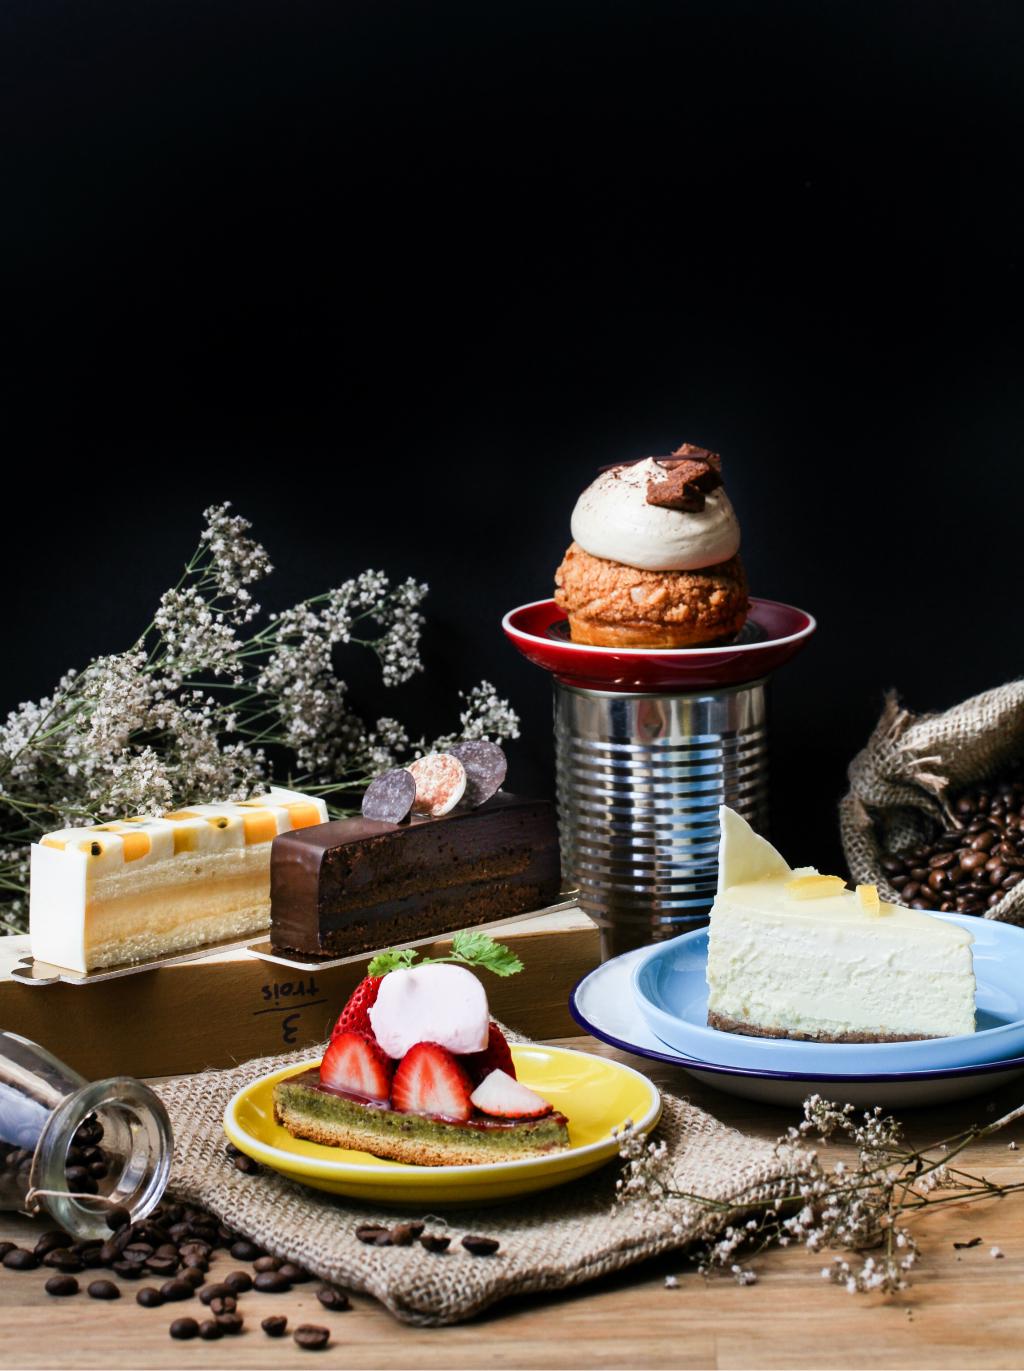 Good Desserts @ FIX